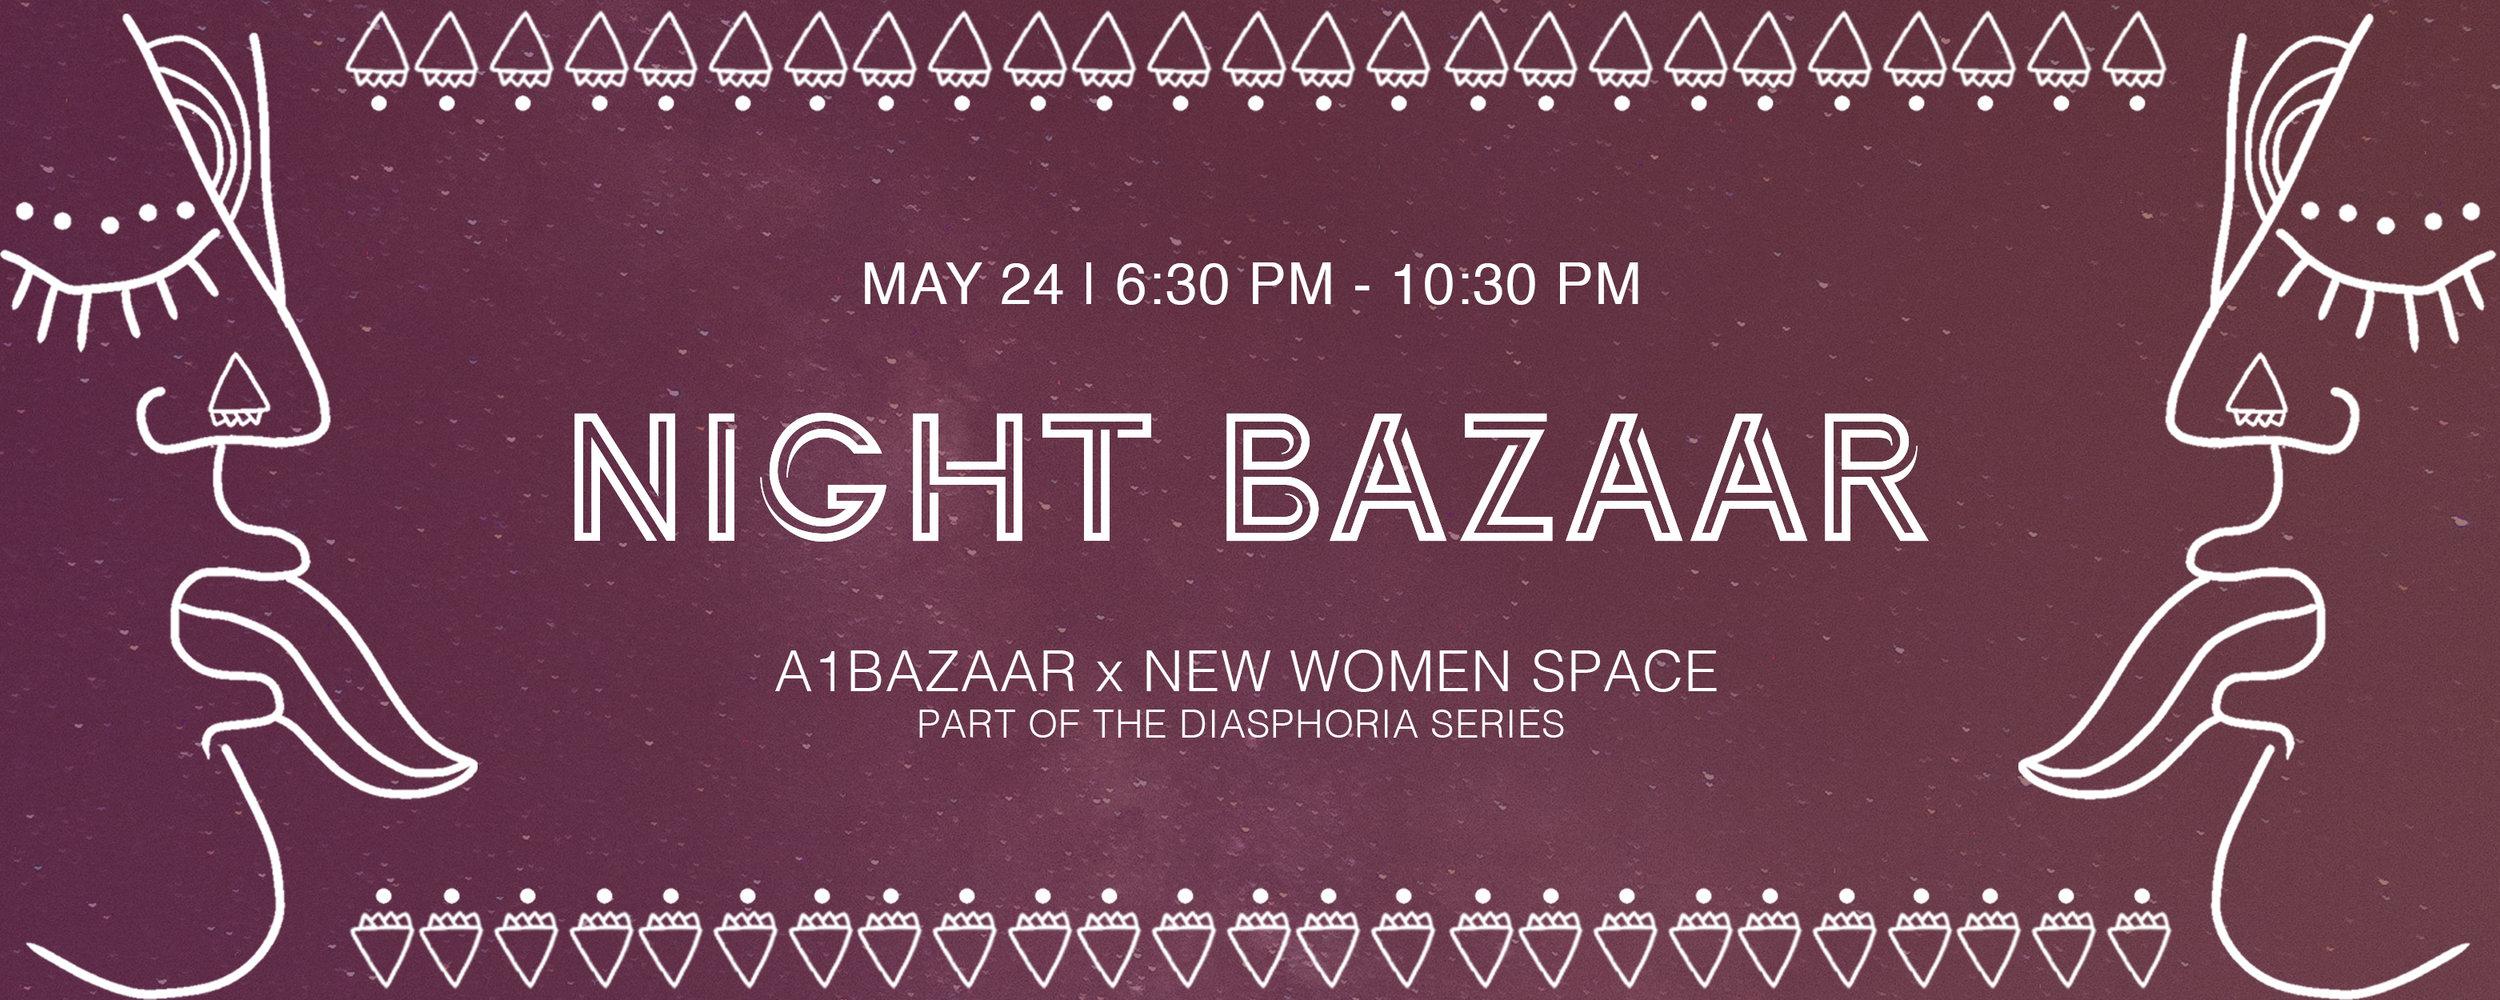 Diasphoria A1Bazaar_Night Bazaar.jpg